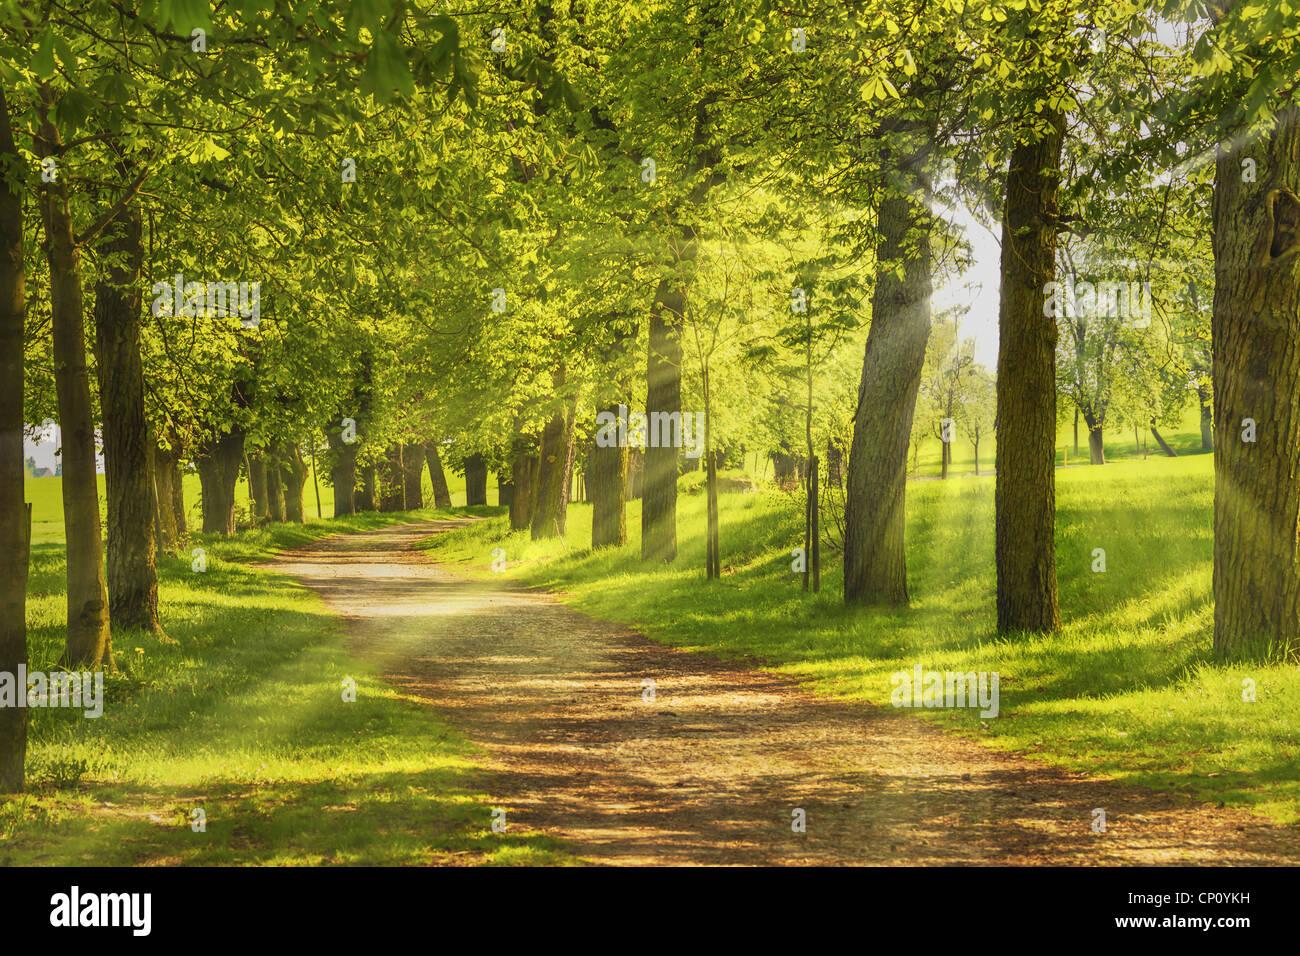 Baumallee, die Sonne scheint duch die Bäume | Avenue of trees, the sun shining through the trees - Stock Image